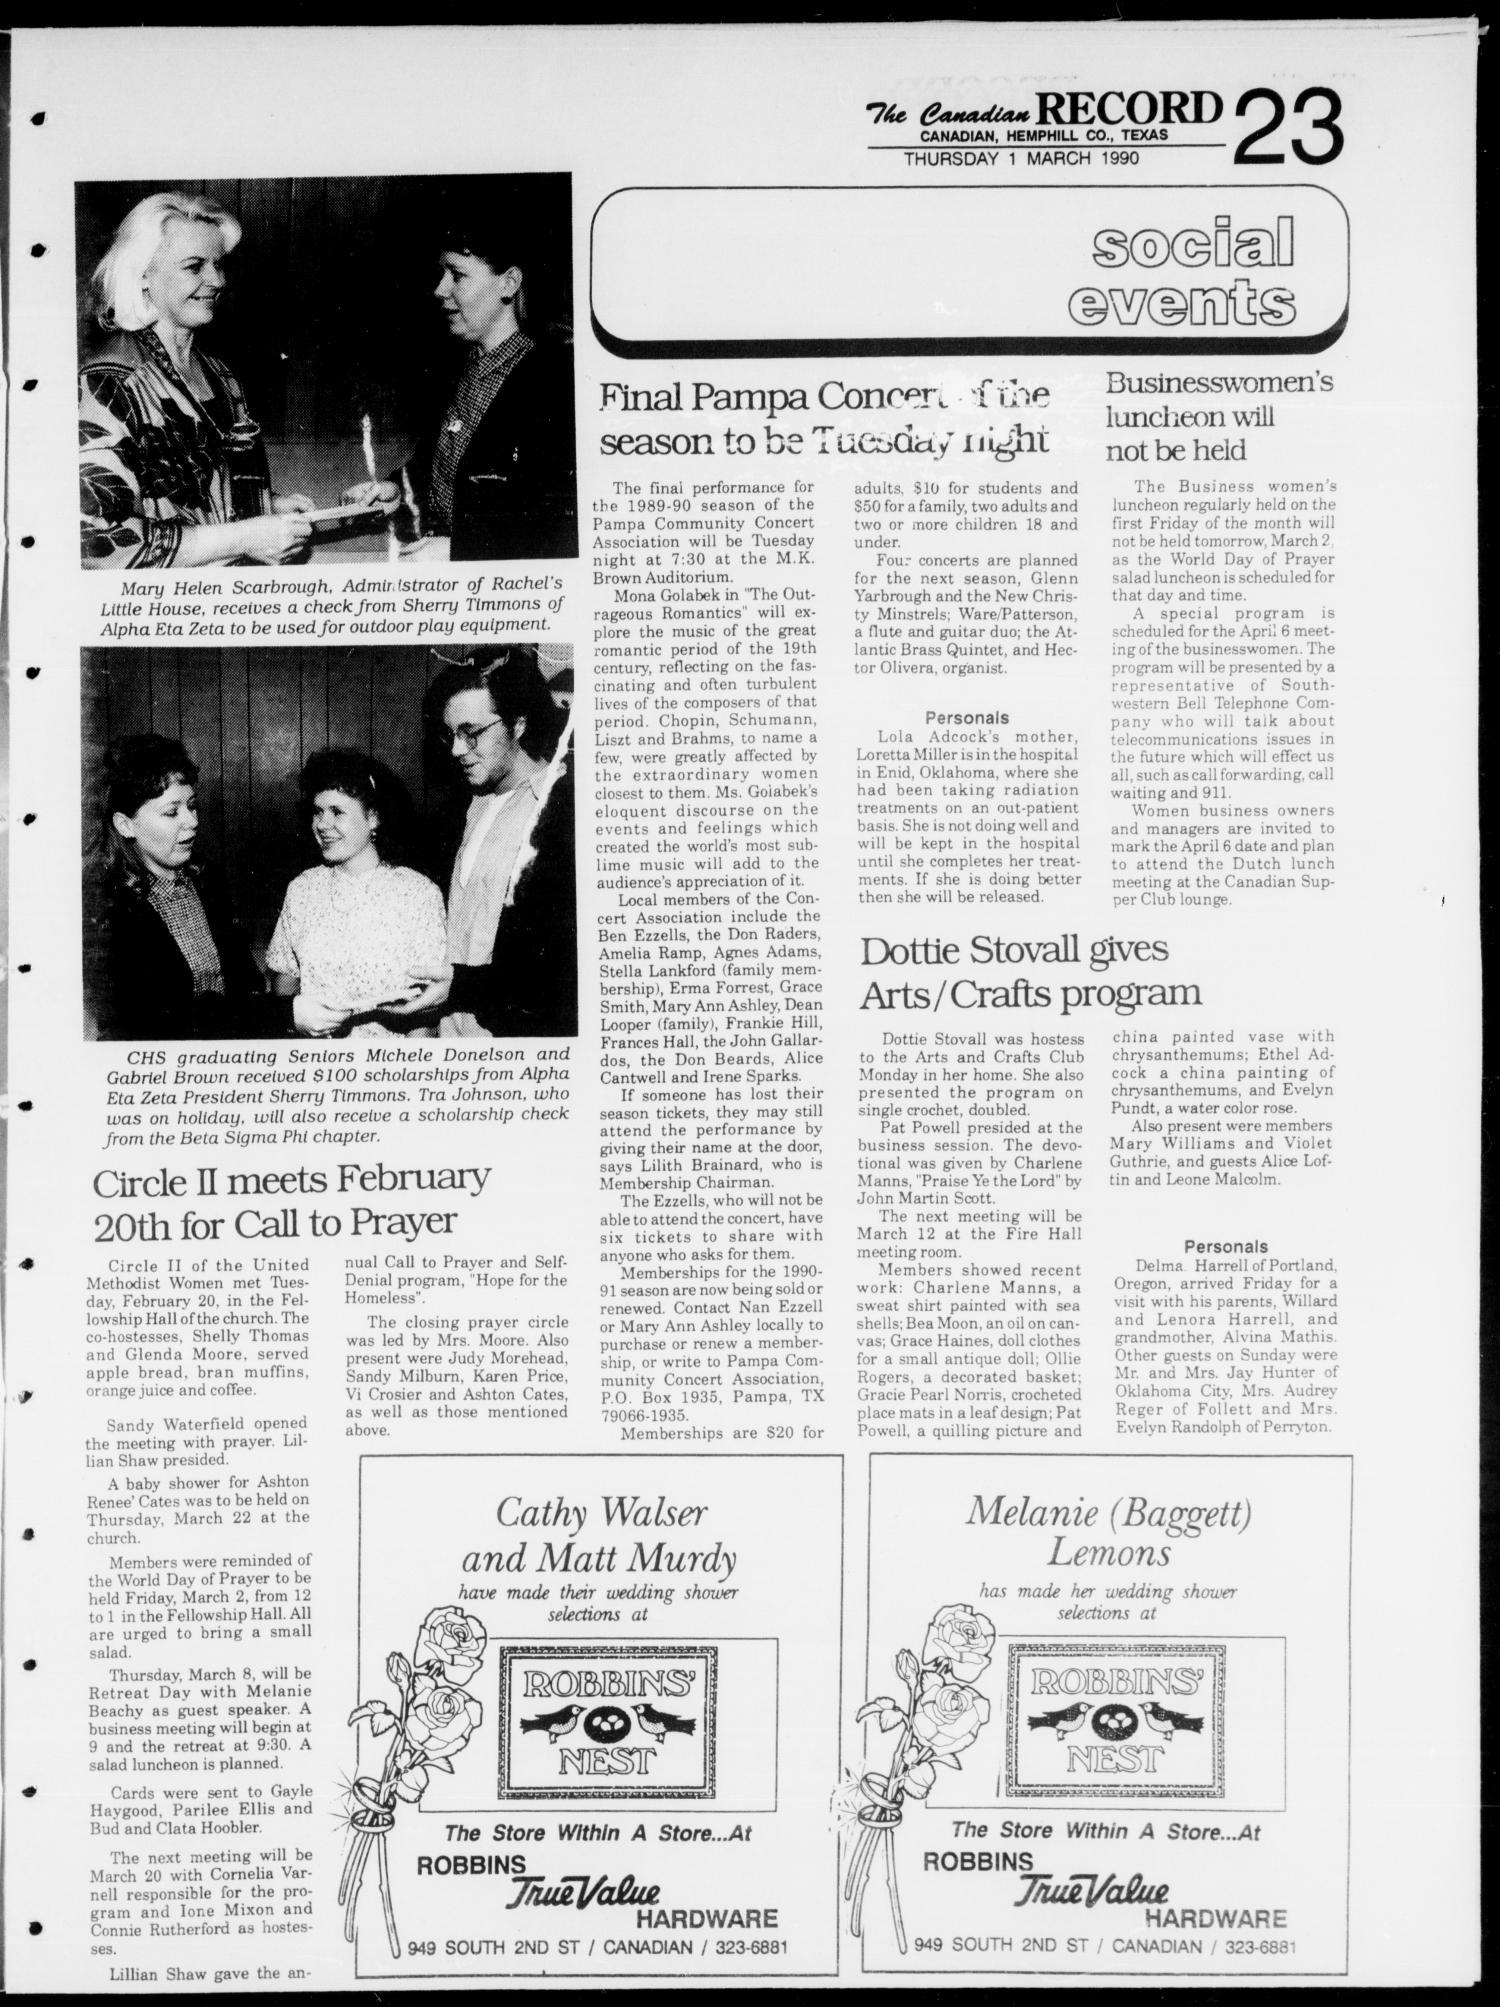 The Canadian Record (Canadian, Tex ), Vol  100, No  9, Ed  1